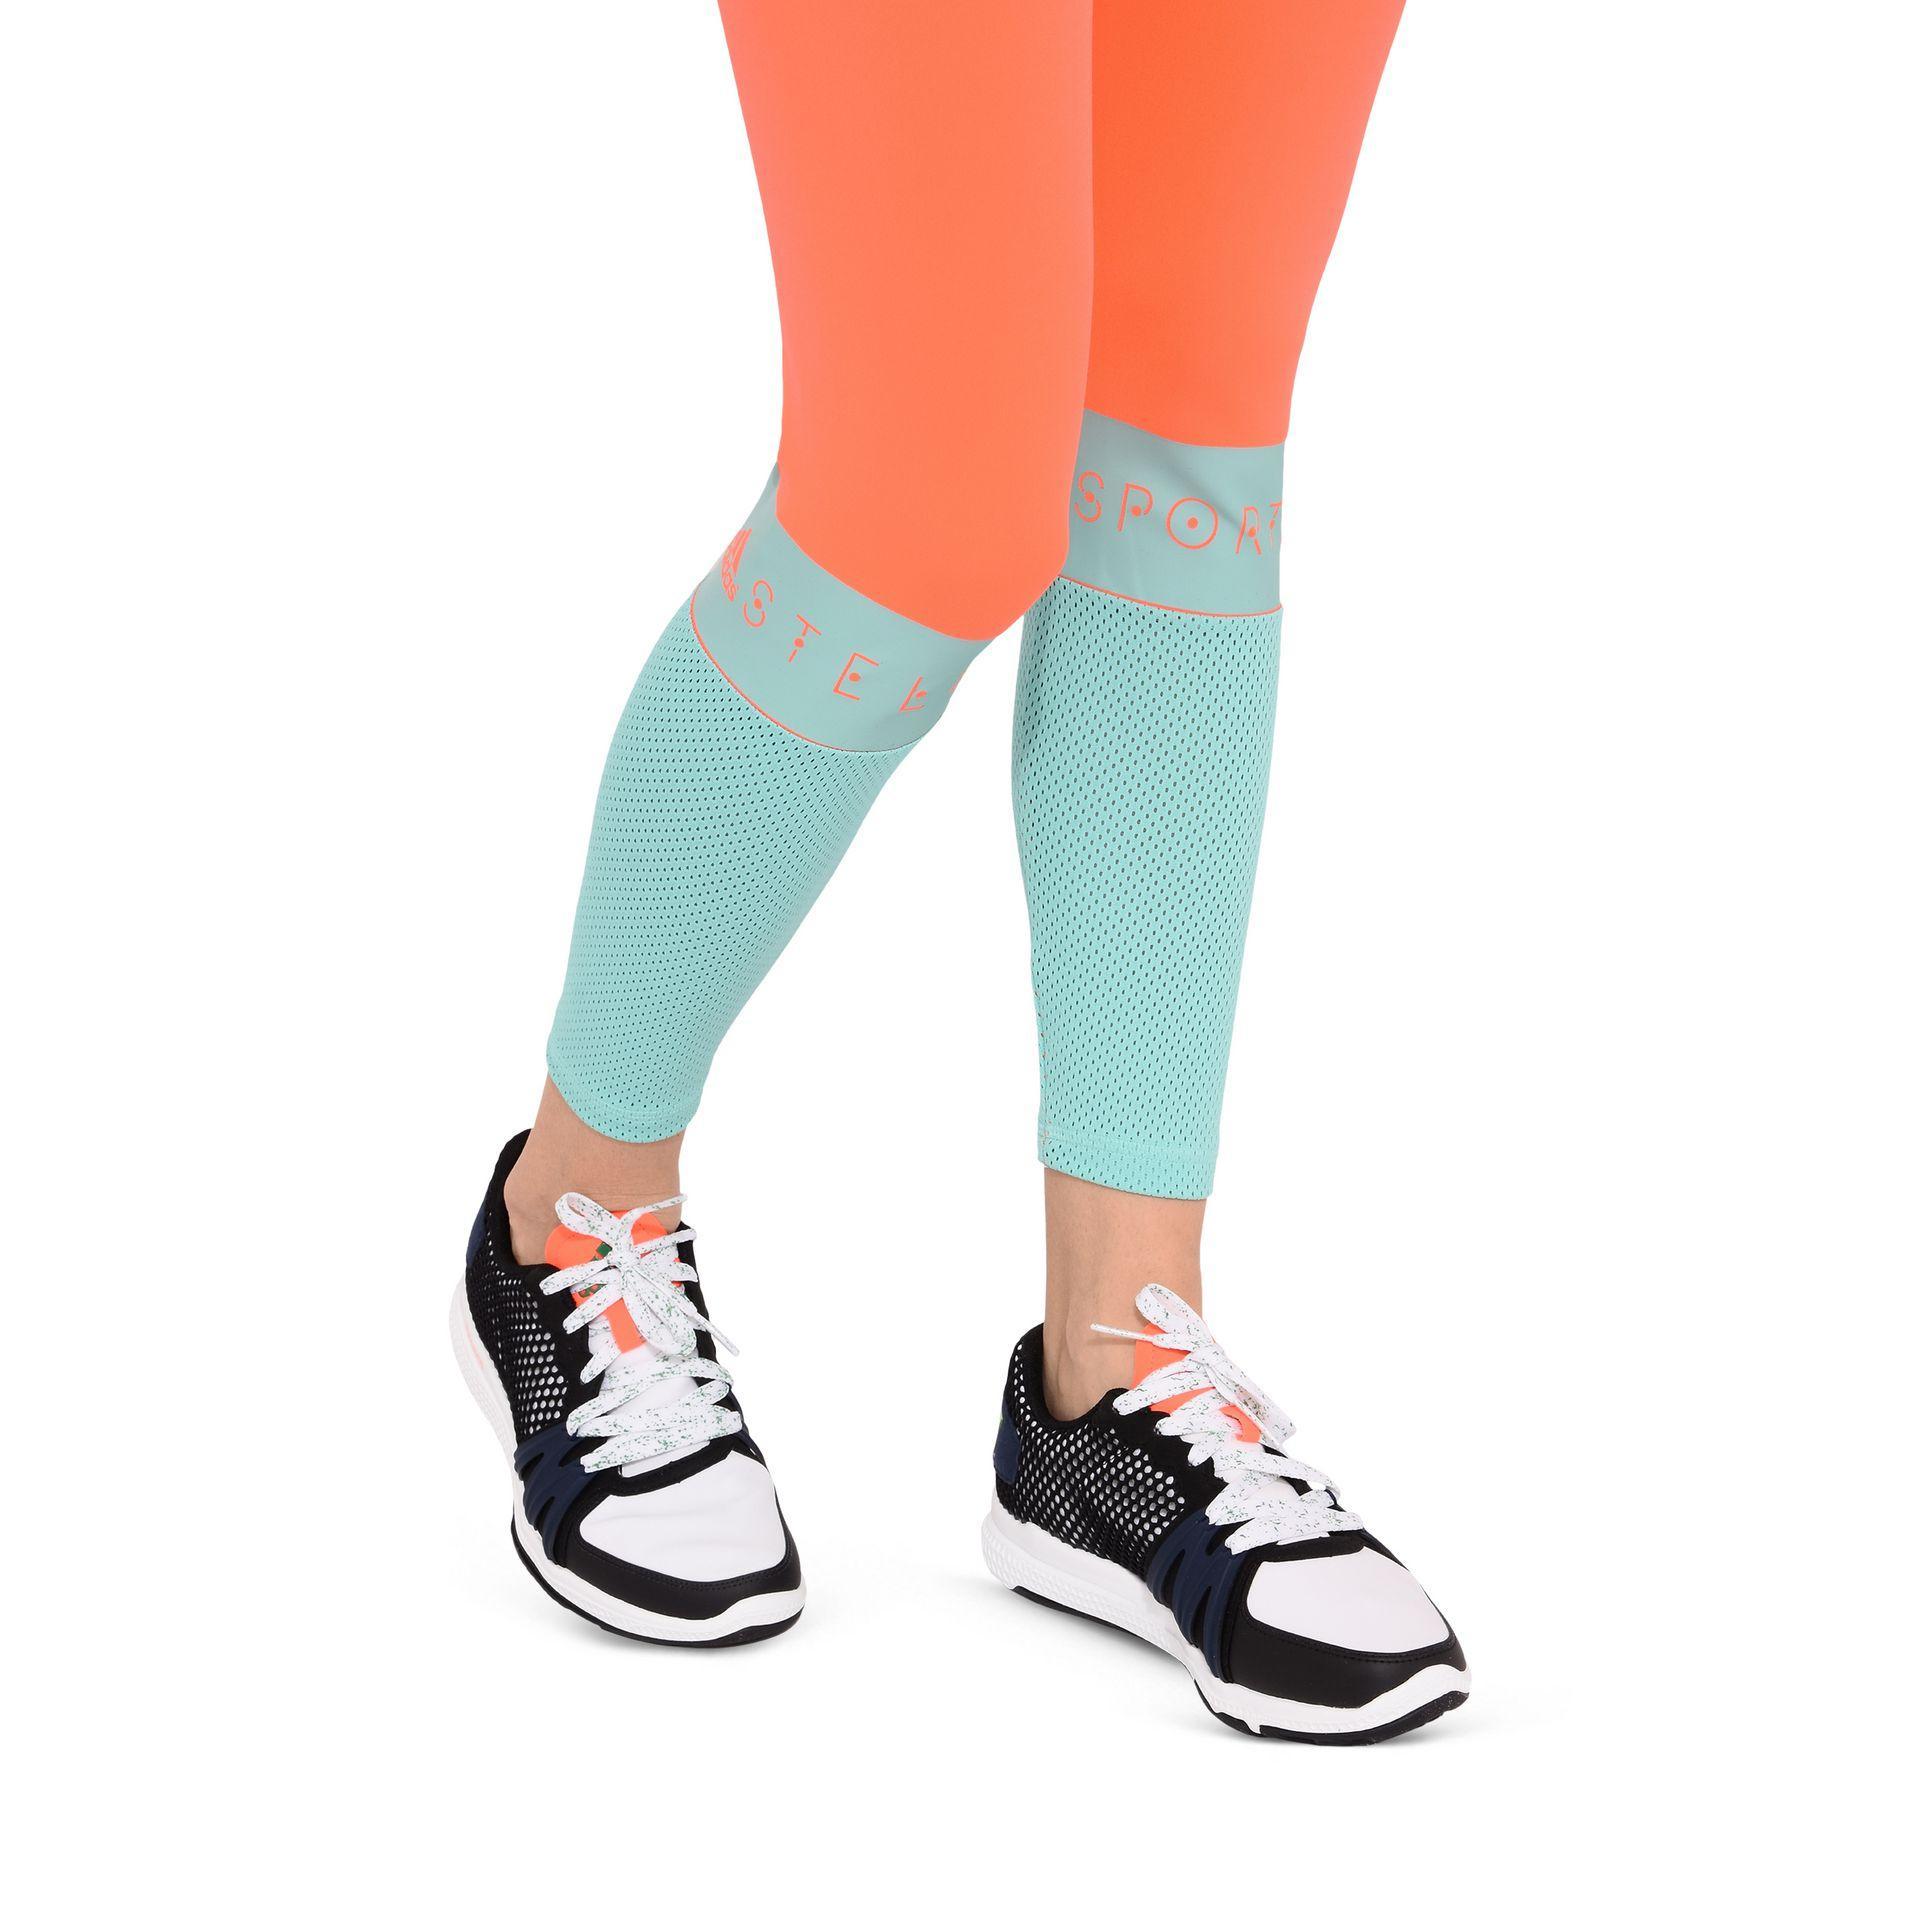 Adidas de stella Adidas mccartney Orange Bicolour rojo Long Leggings en stella rojo | ab1d755 - amningopskrift.website